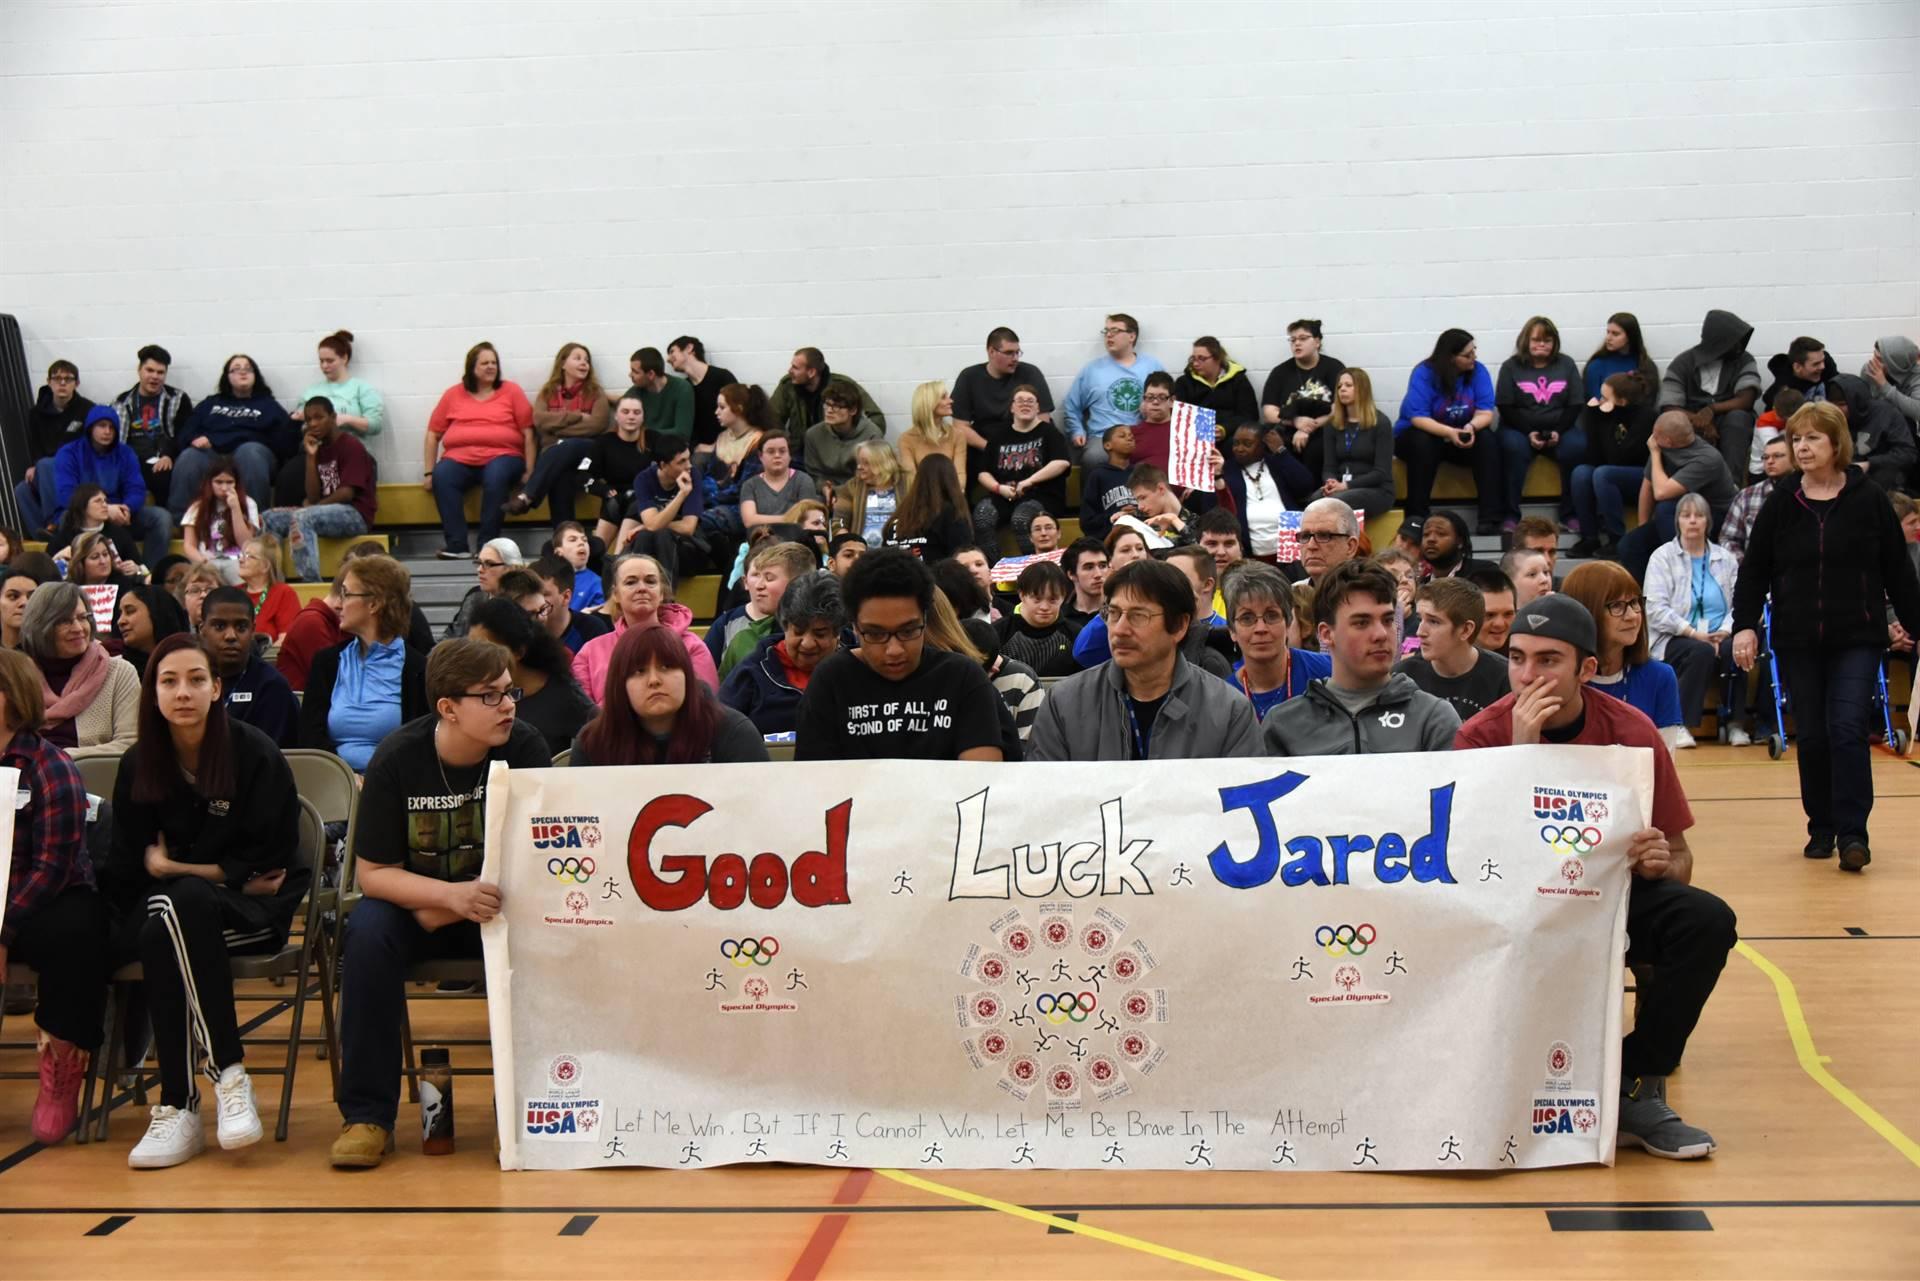 Jared Lamb World Games pep rally